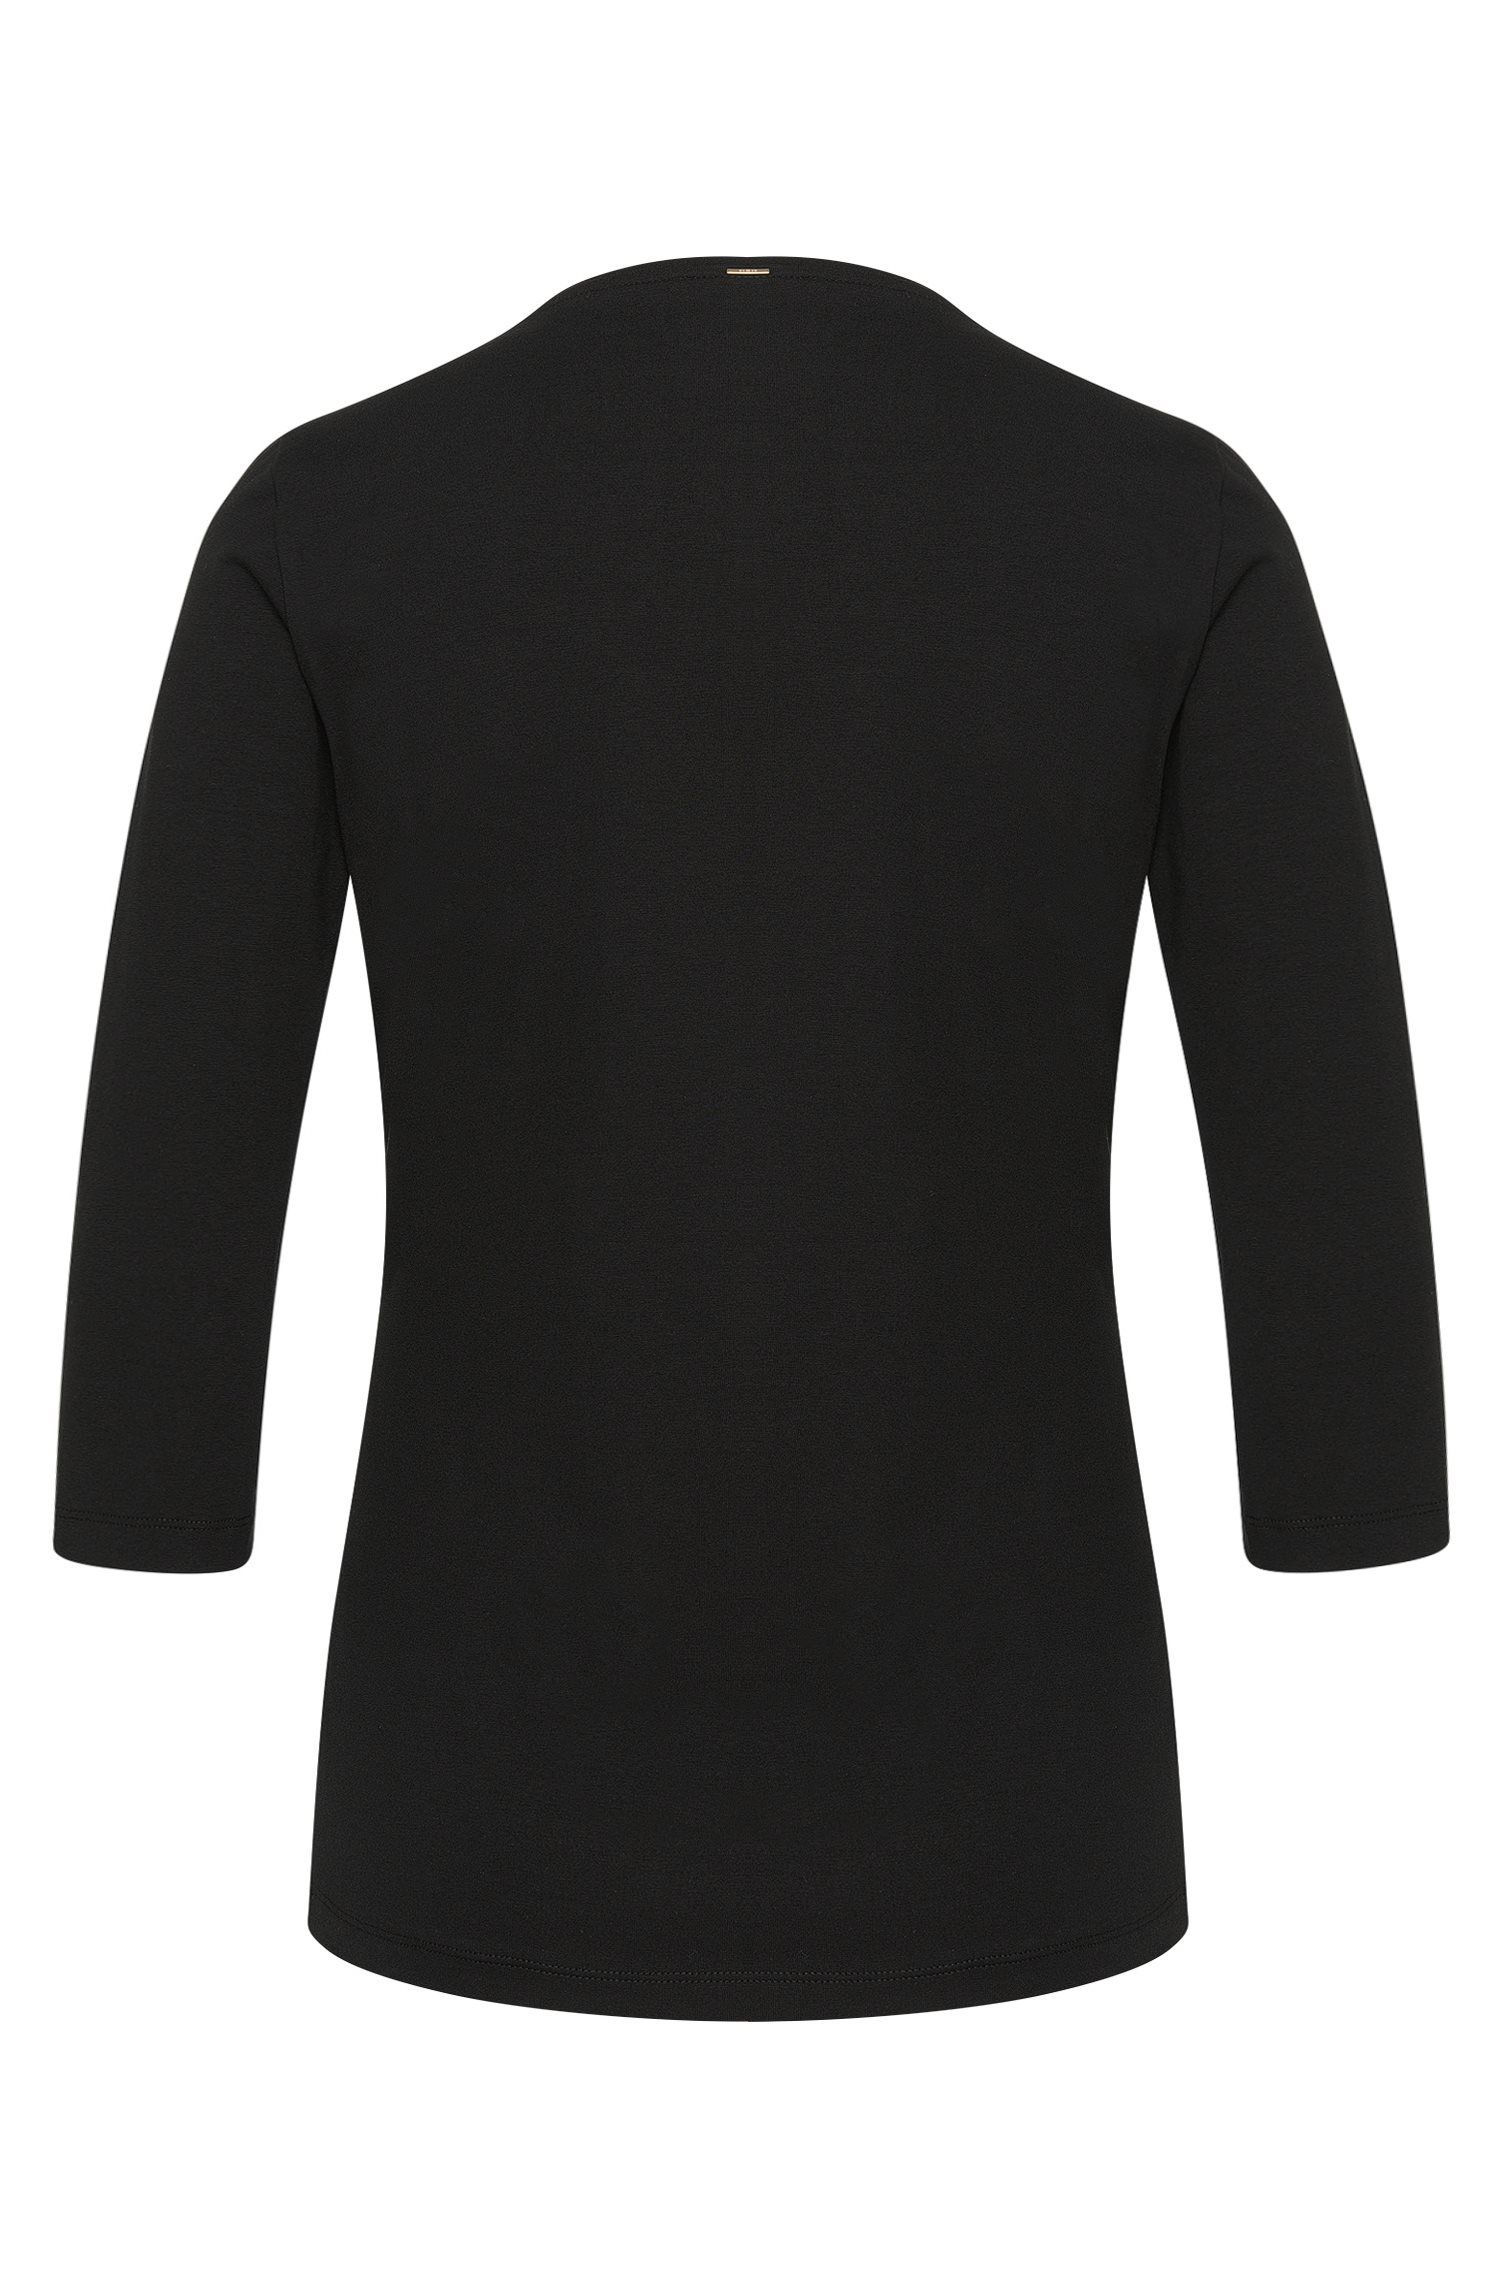 Jerseytop met plissédetail